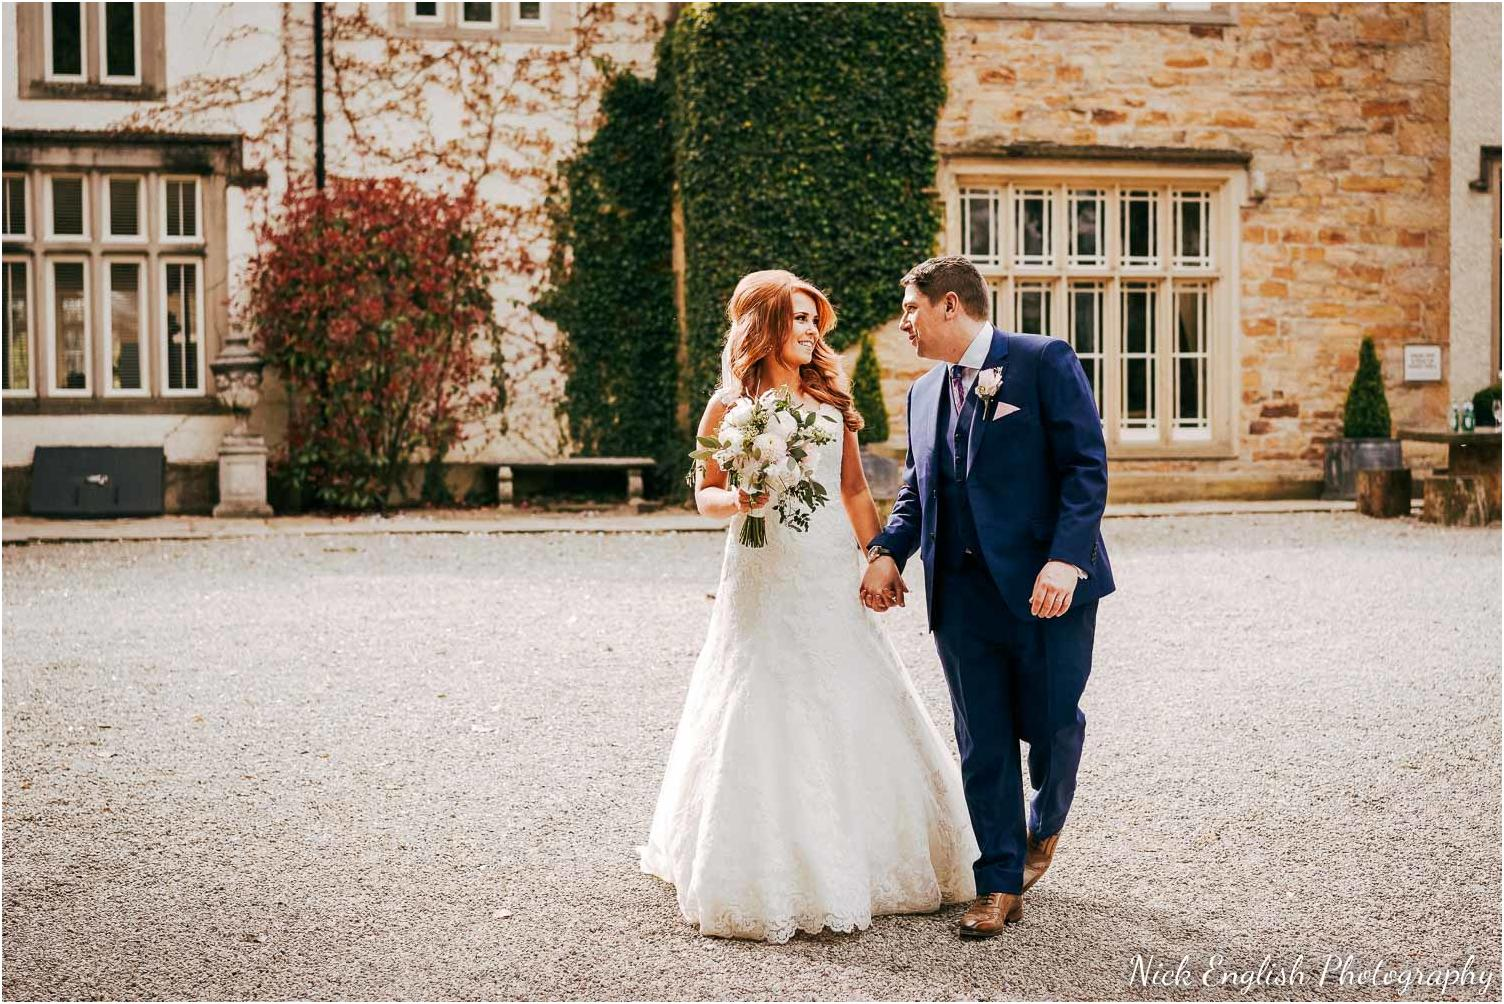 Mitton_Hall_Wedding_Photographer-125.jpg